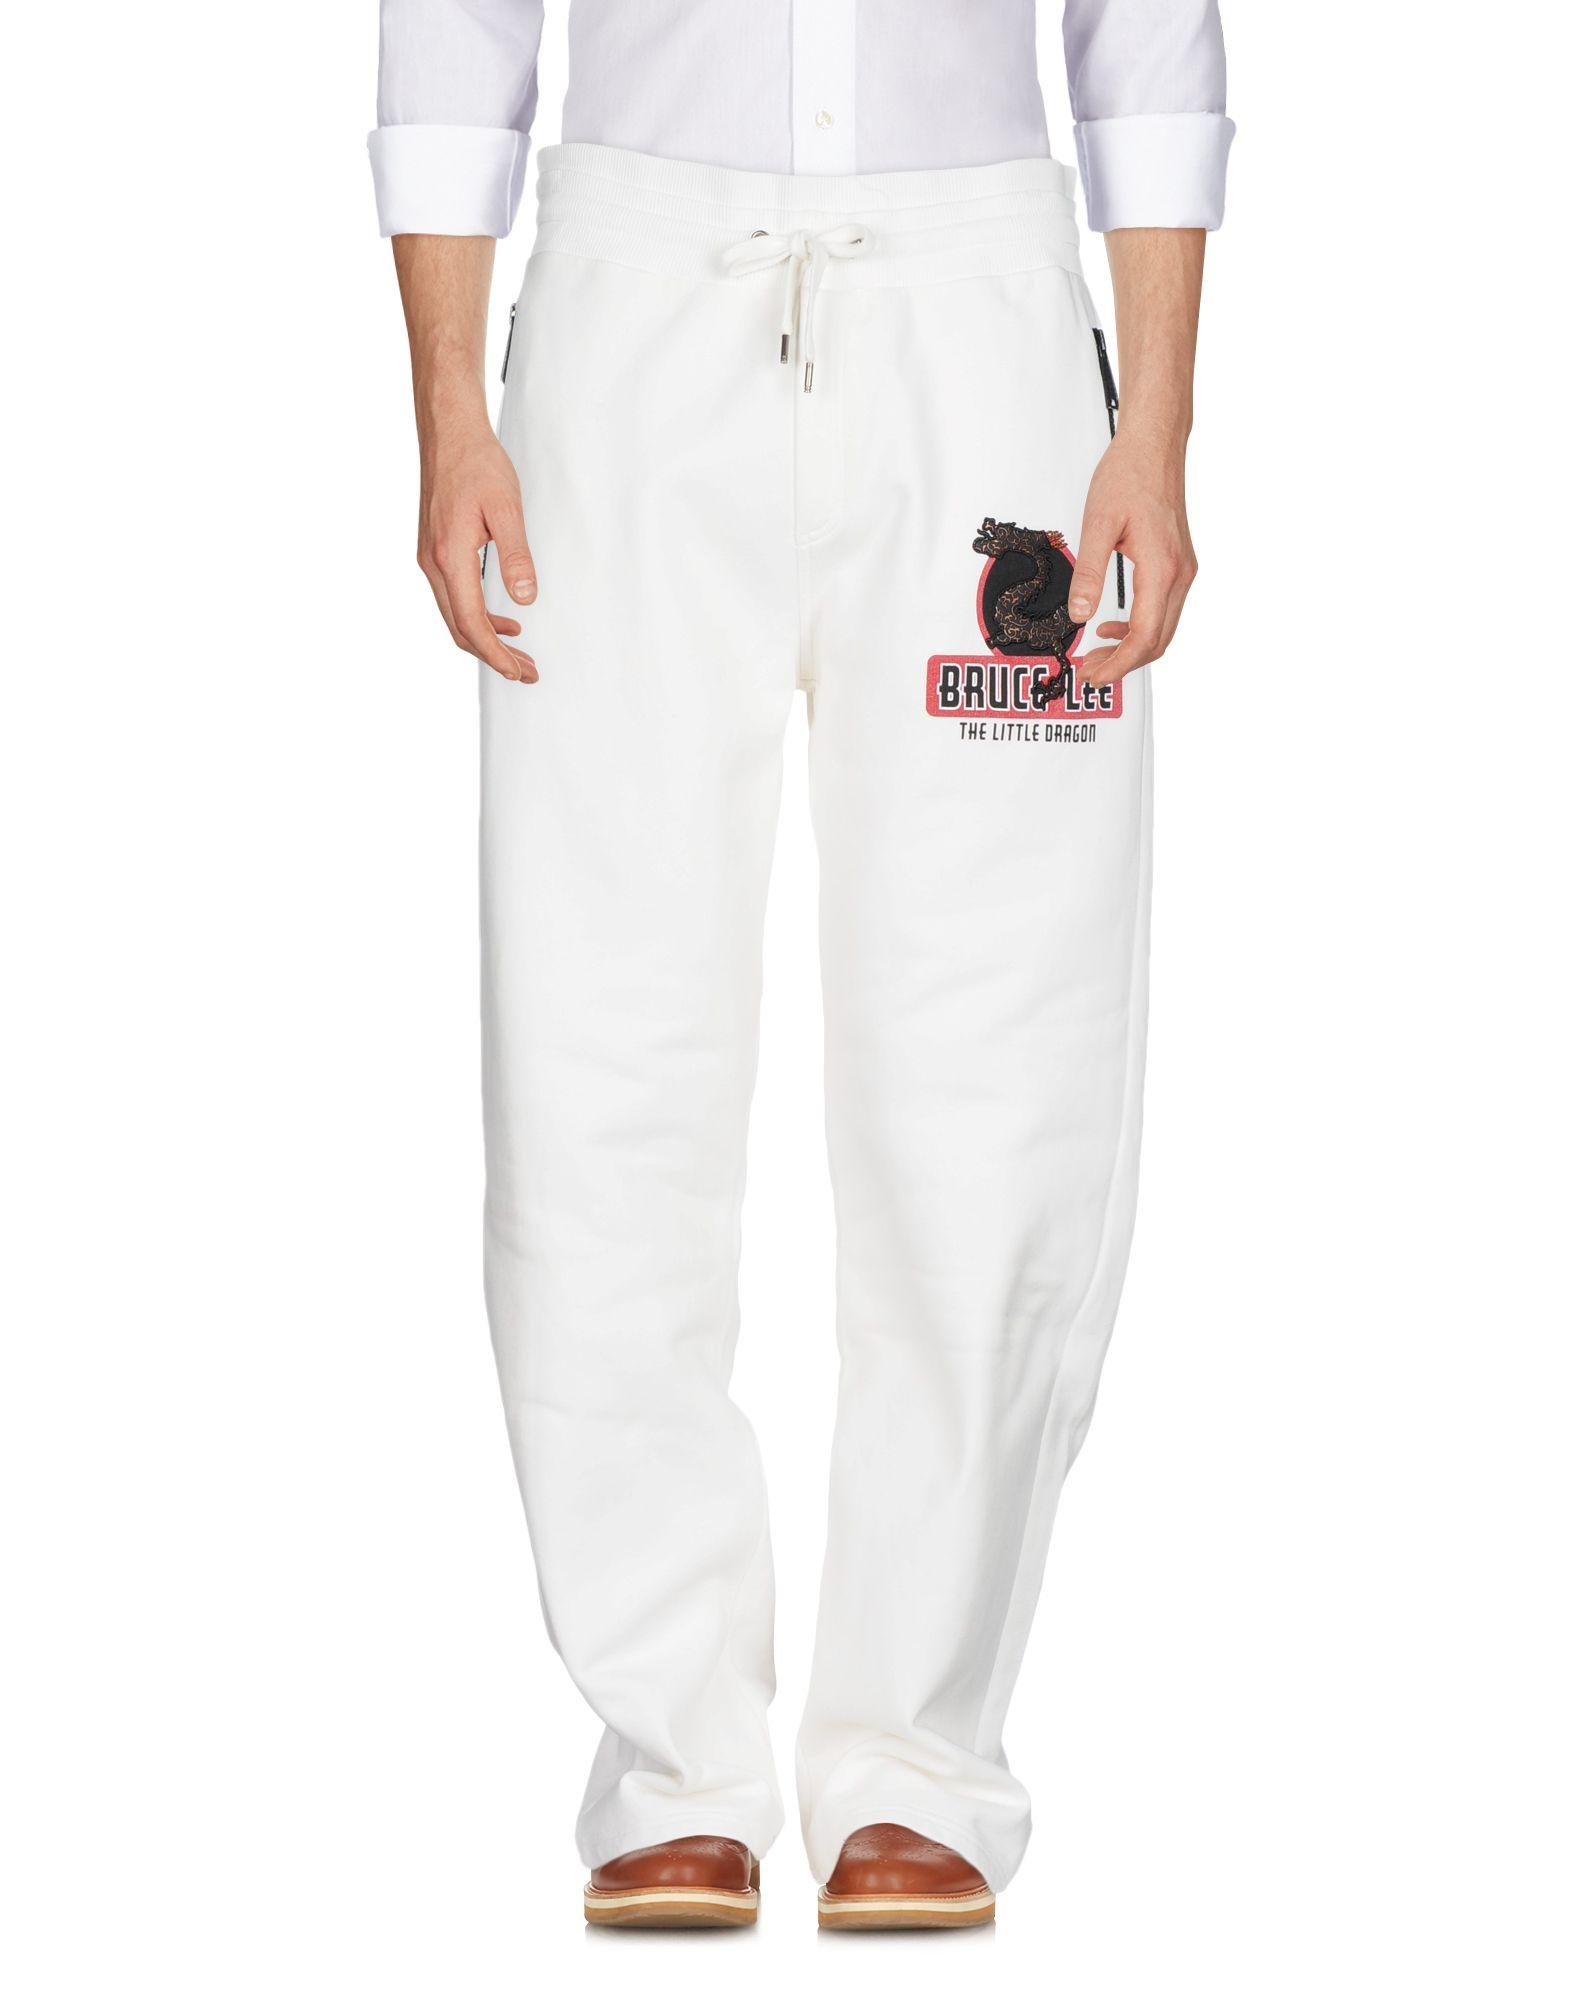 Pantalone Philipp Plein Donna - Acquista online su